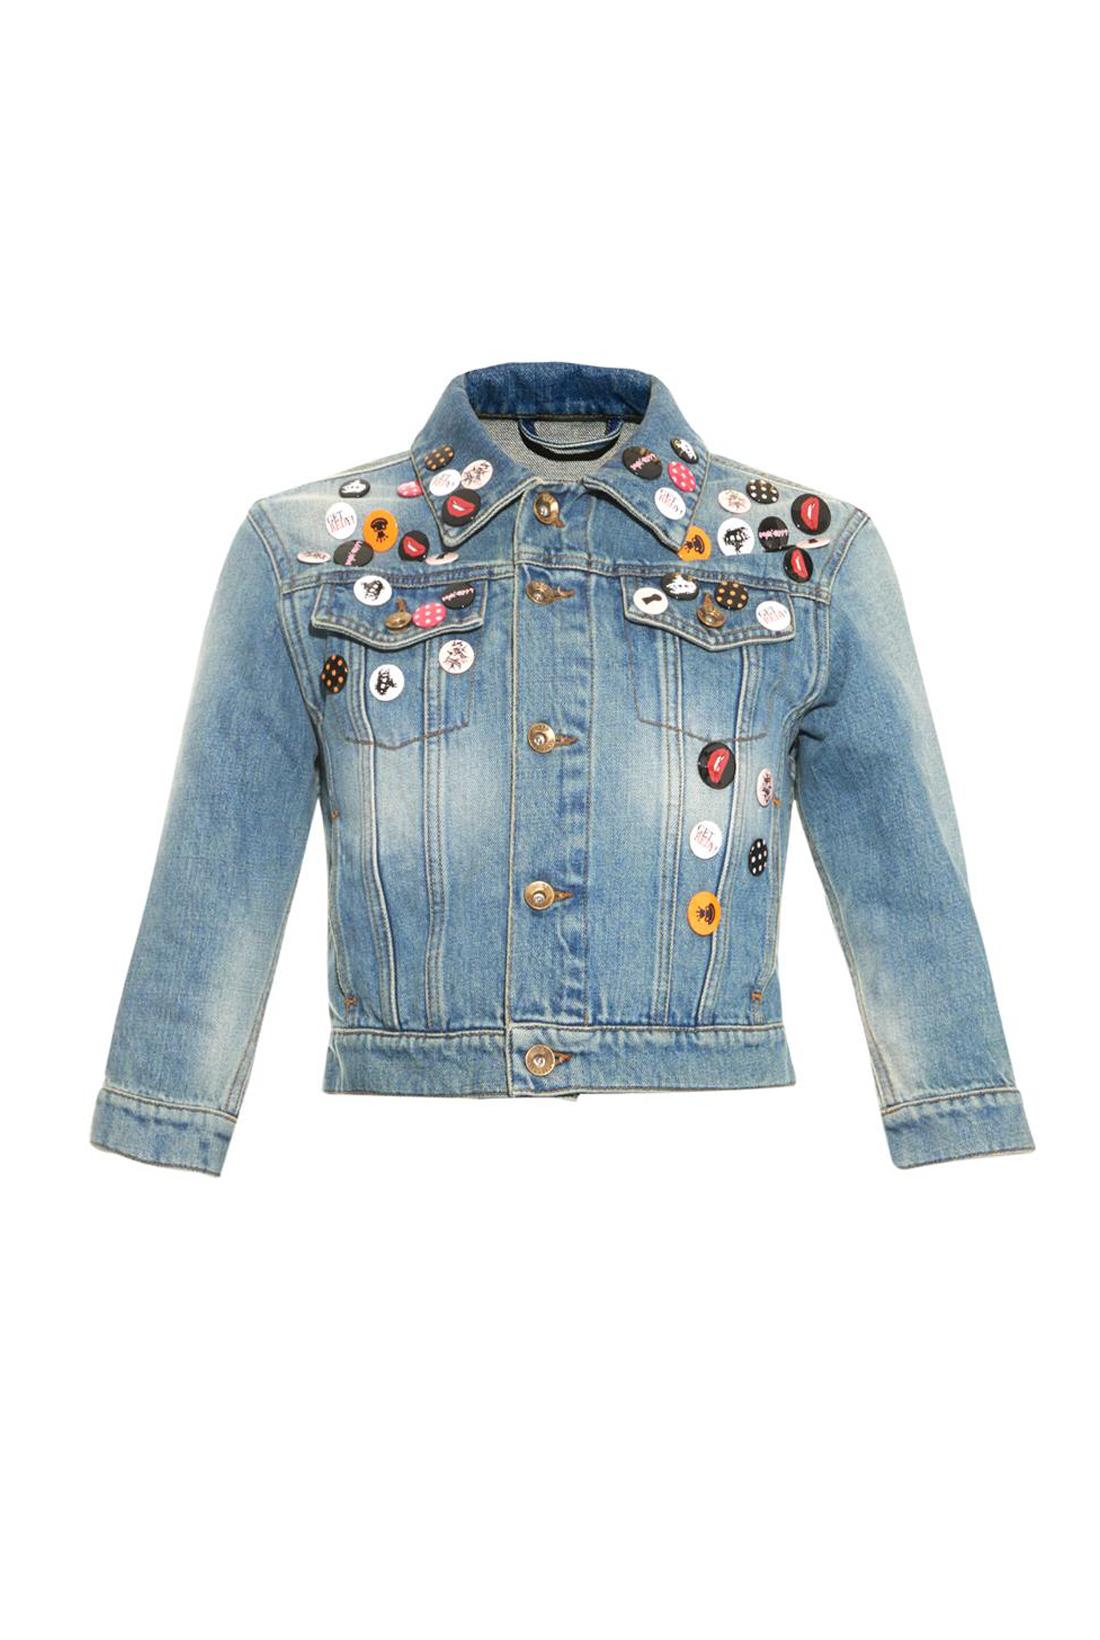 08-spring-denim-trends-shrunken-jackets-04.jpg